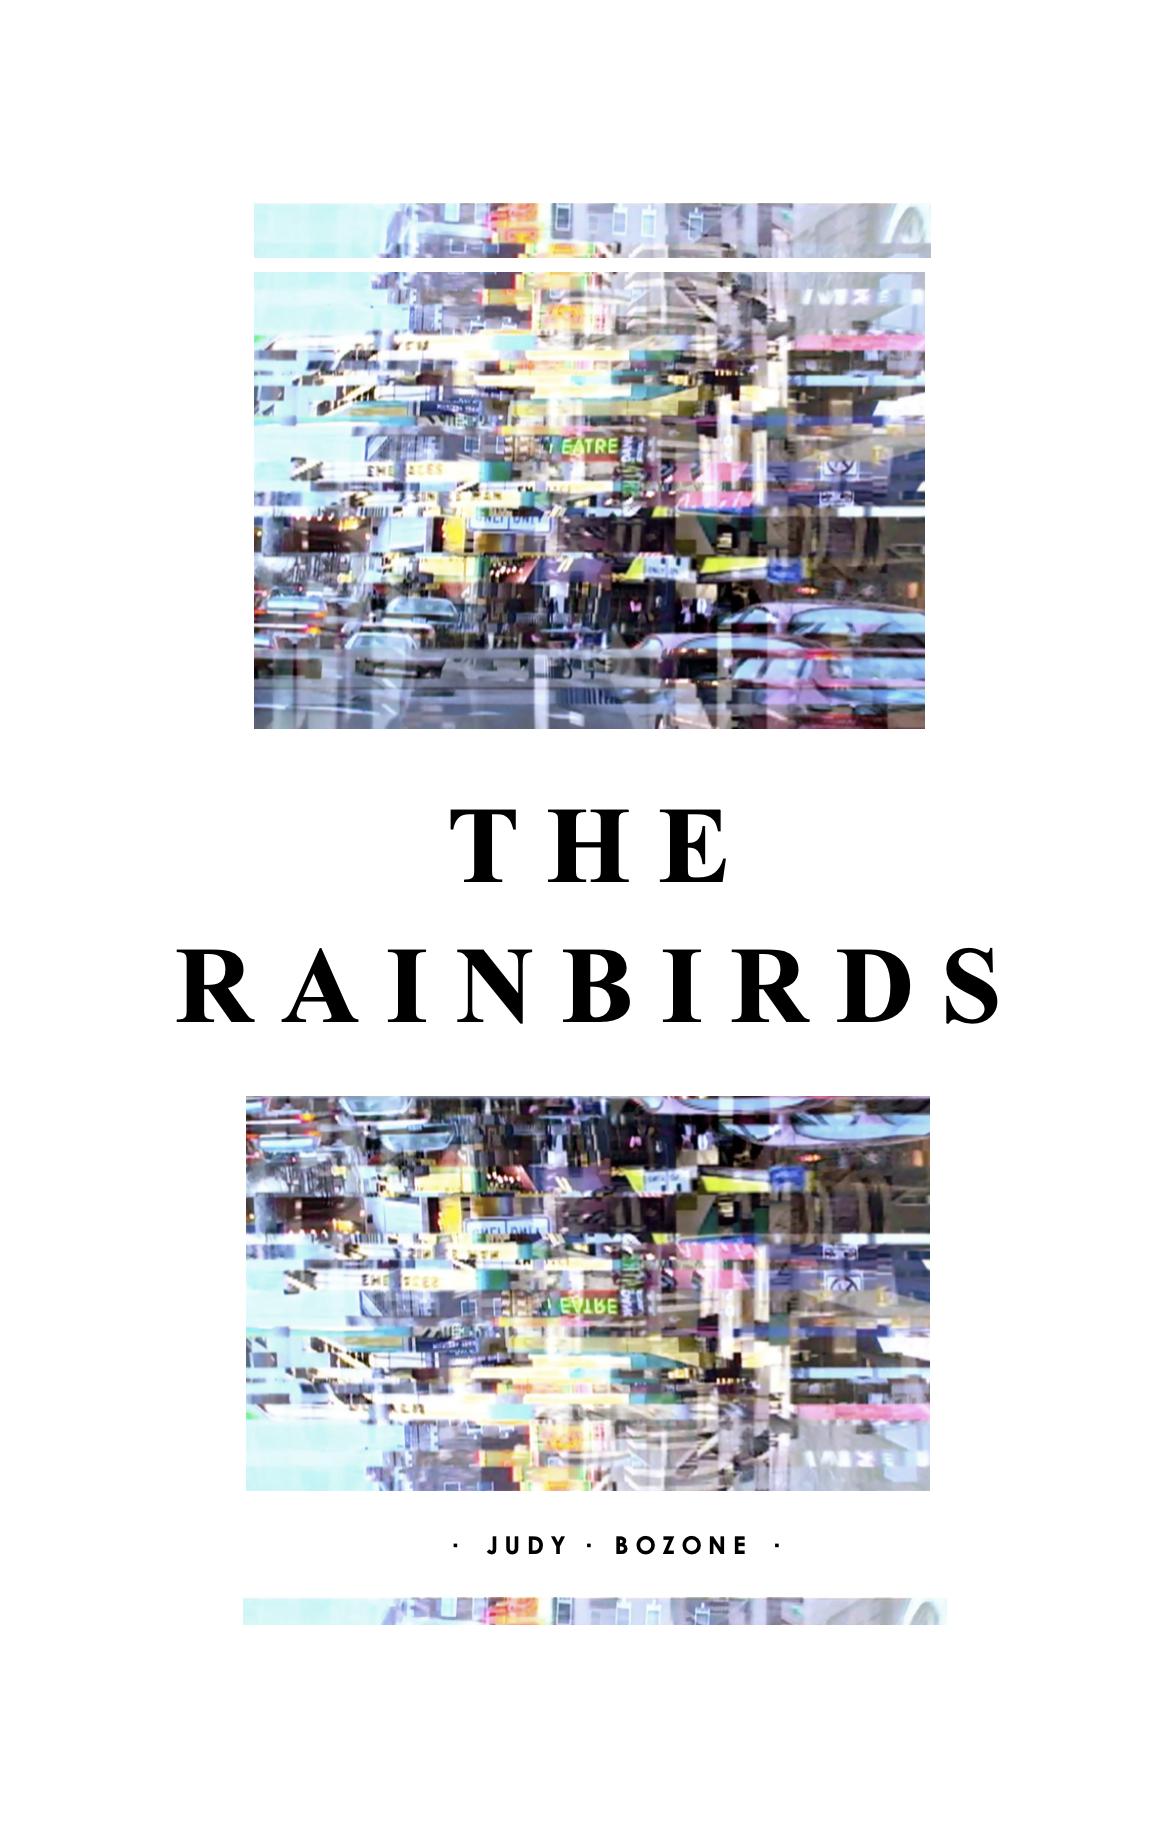 The Rainbirds by Judy Bozone